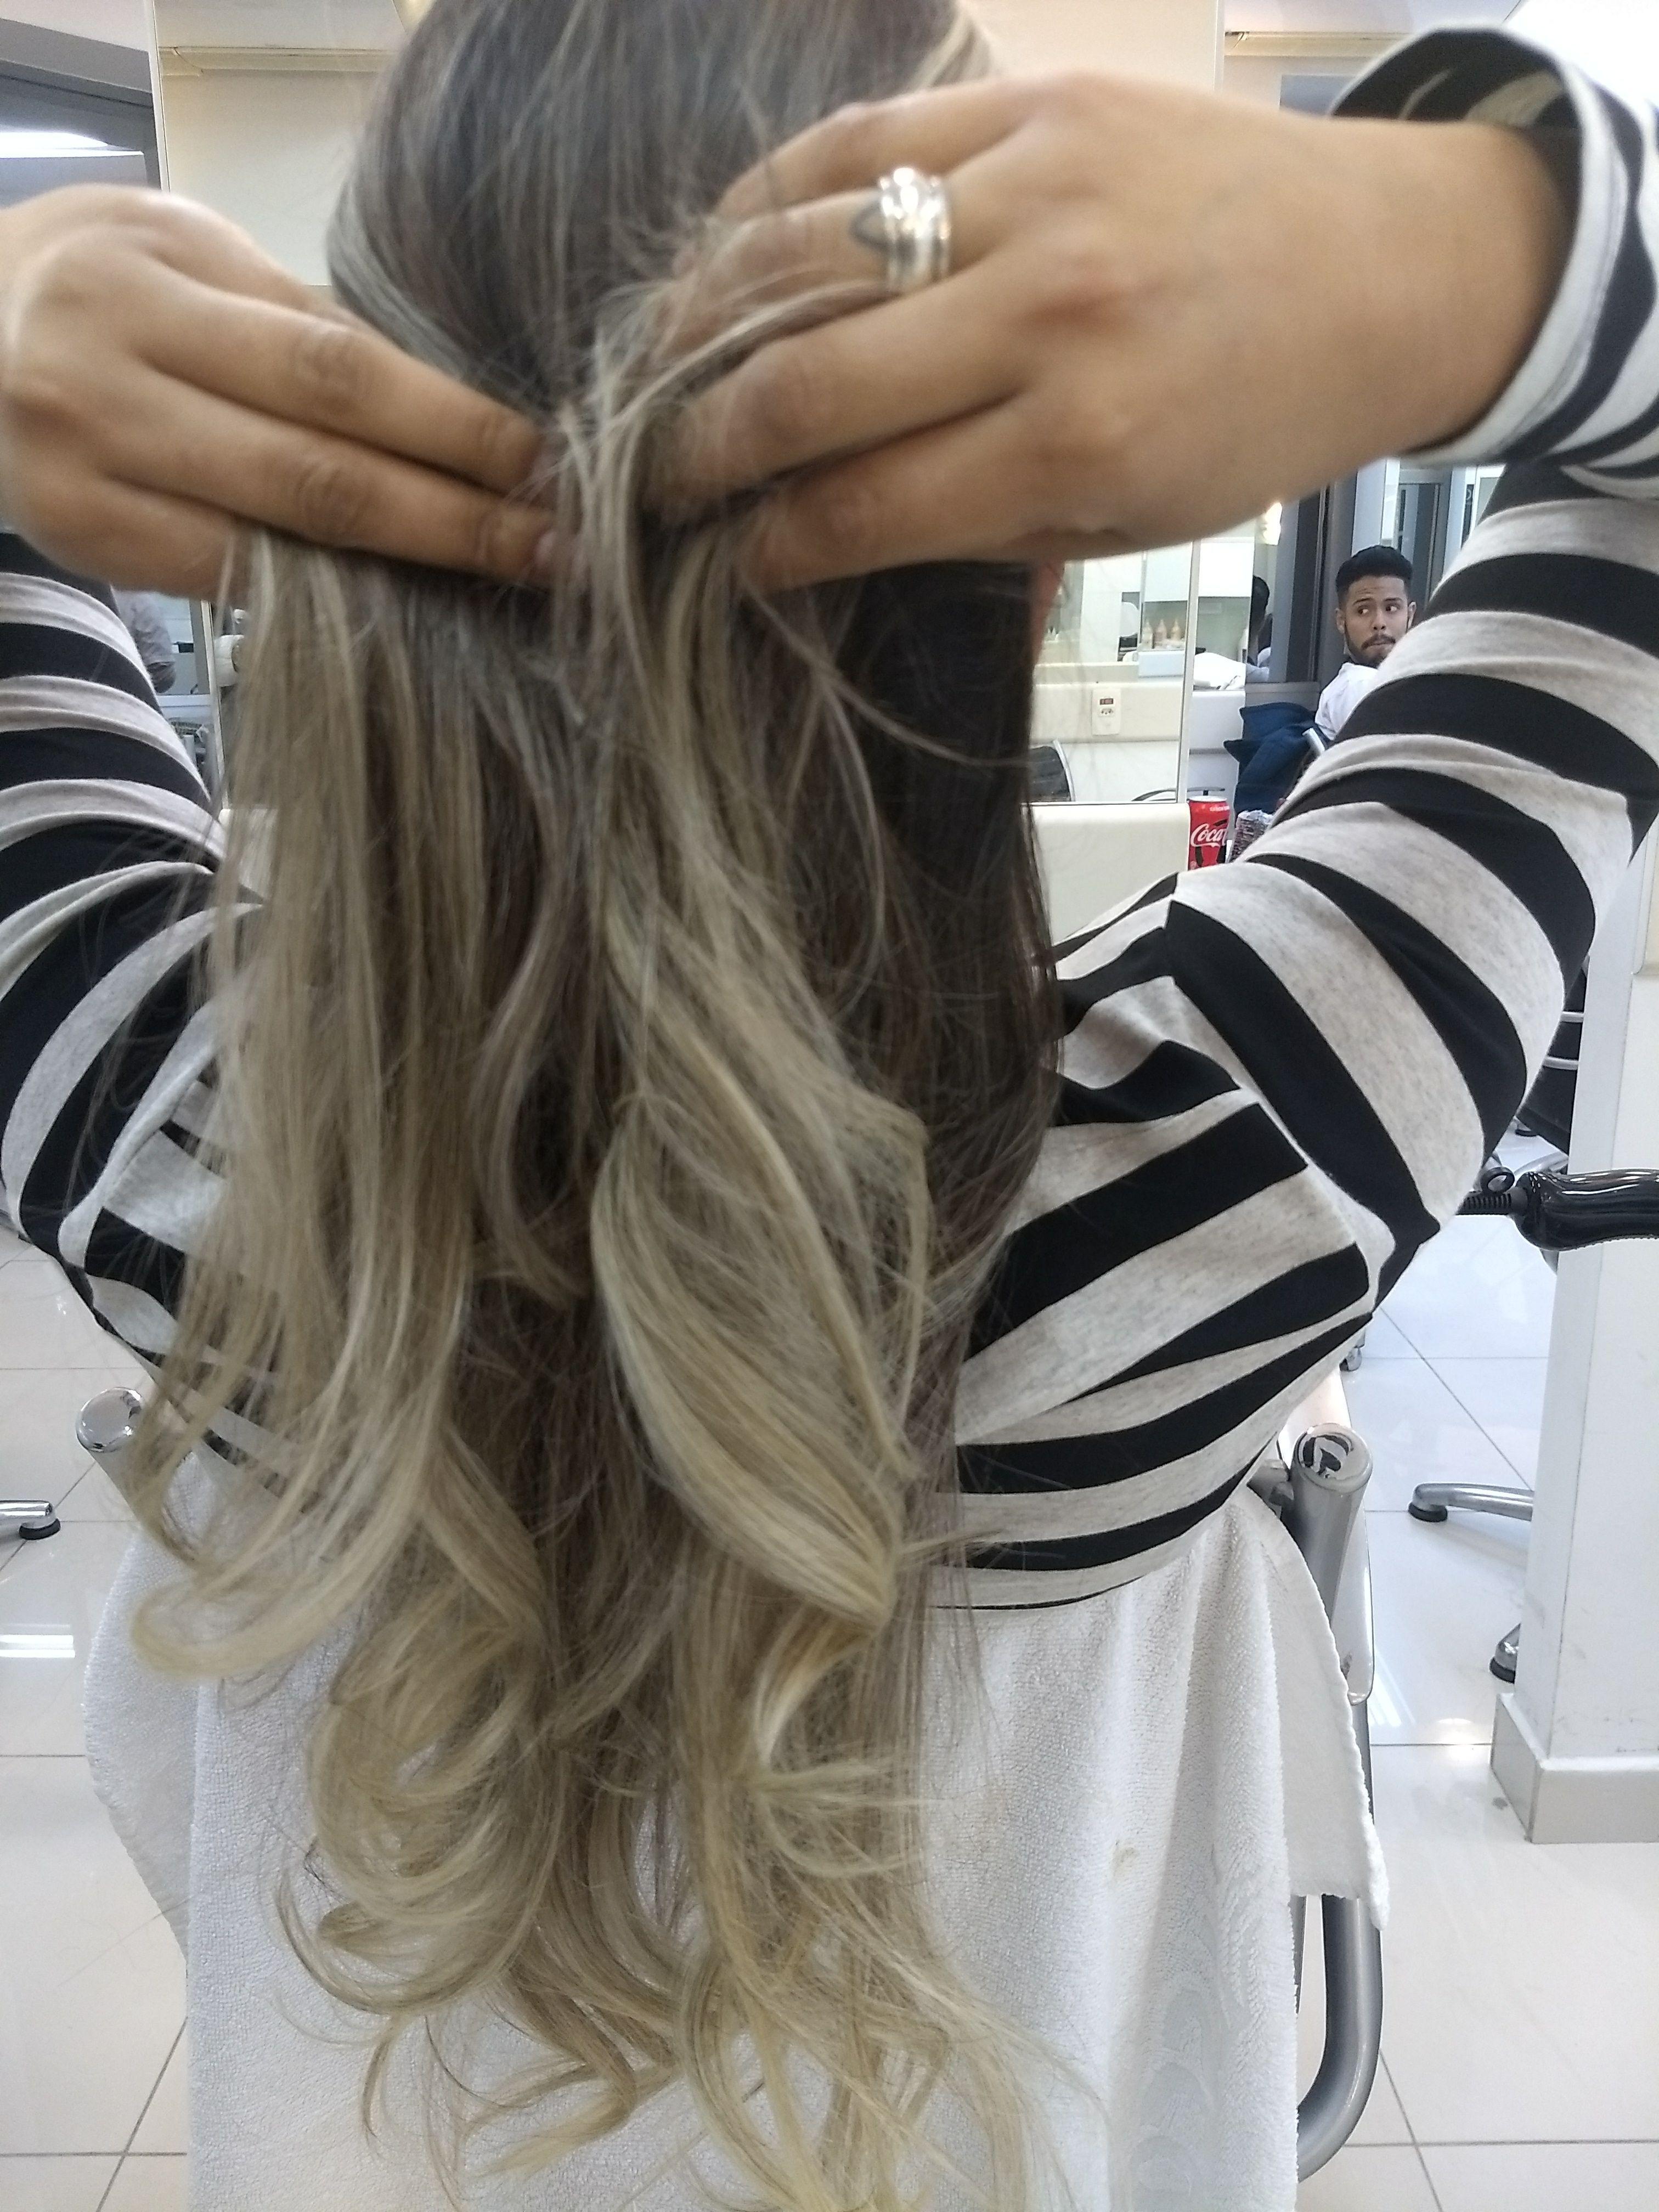 Cachos 😍😍 cabelo auxiliar cabeleireiro(a) escovista